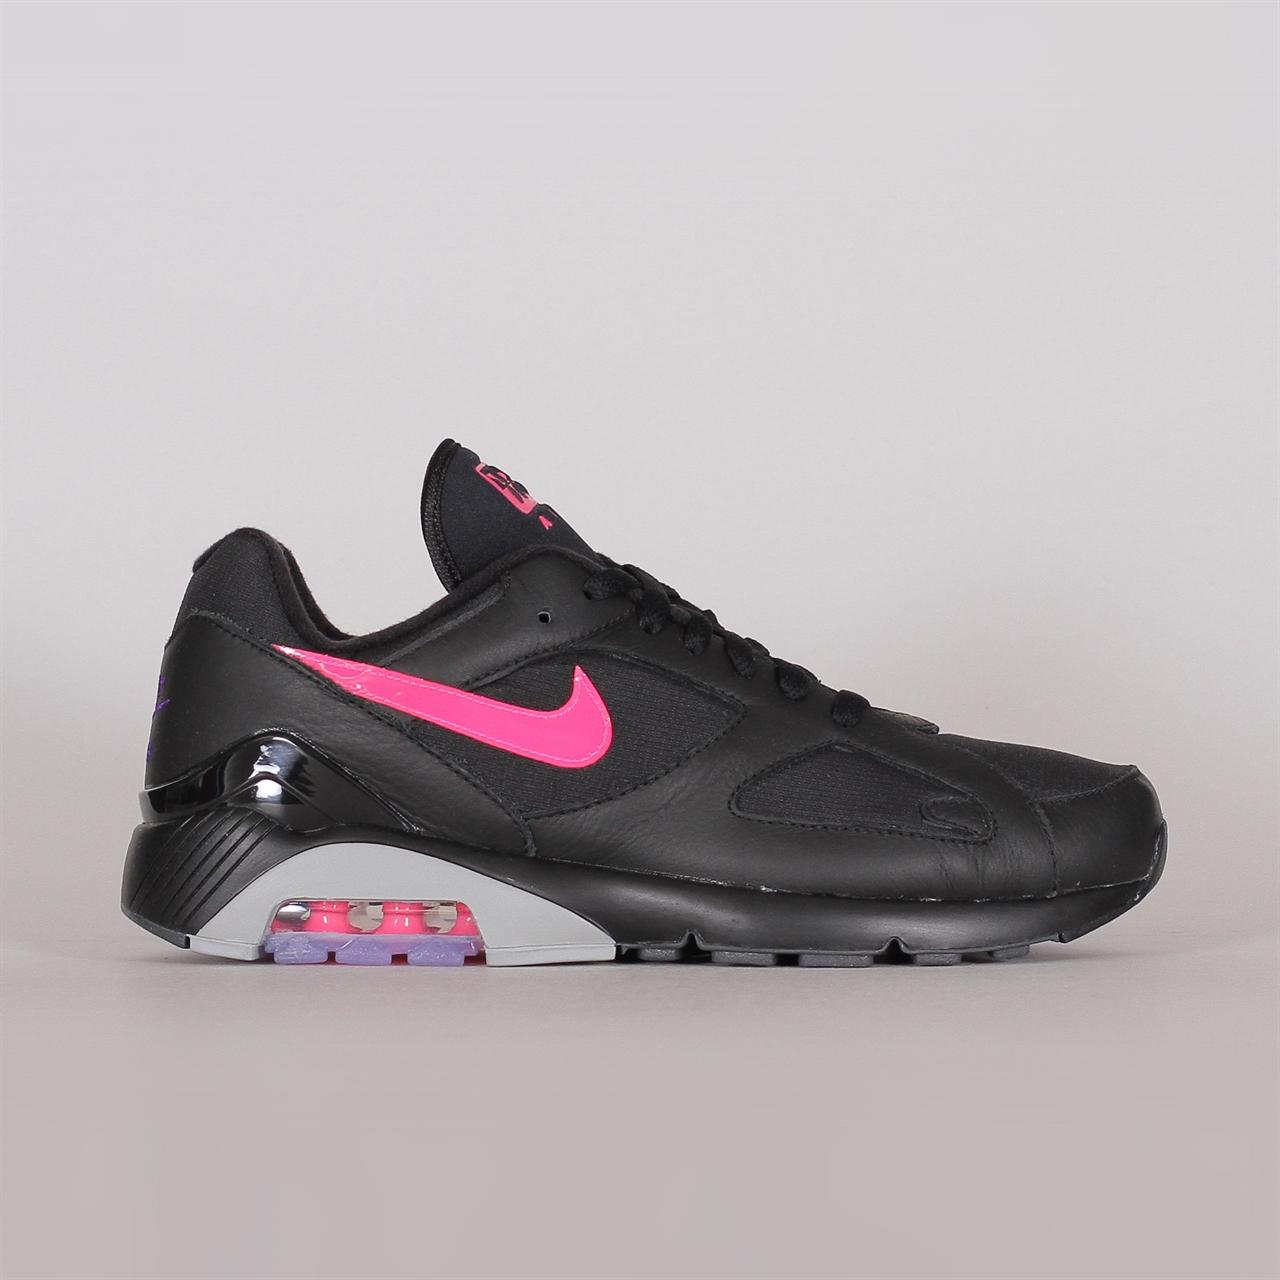 outlet store 2fba8 b6c2a Shelta - Nike Sportswear Air Max 180 (AQ9974-001)